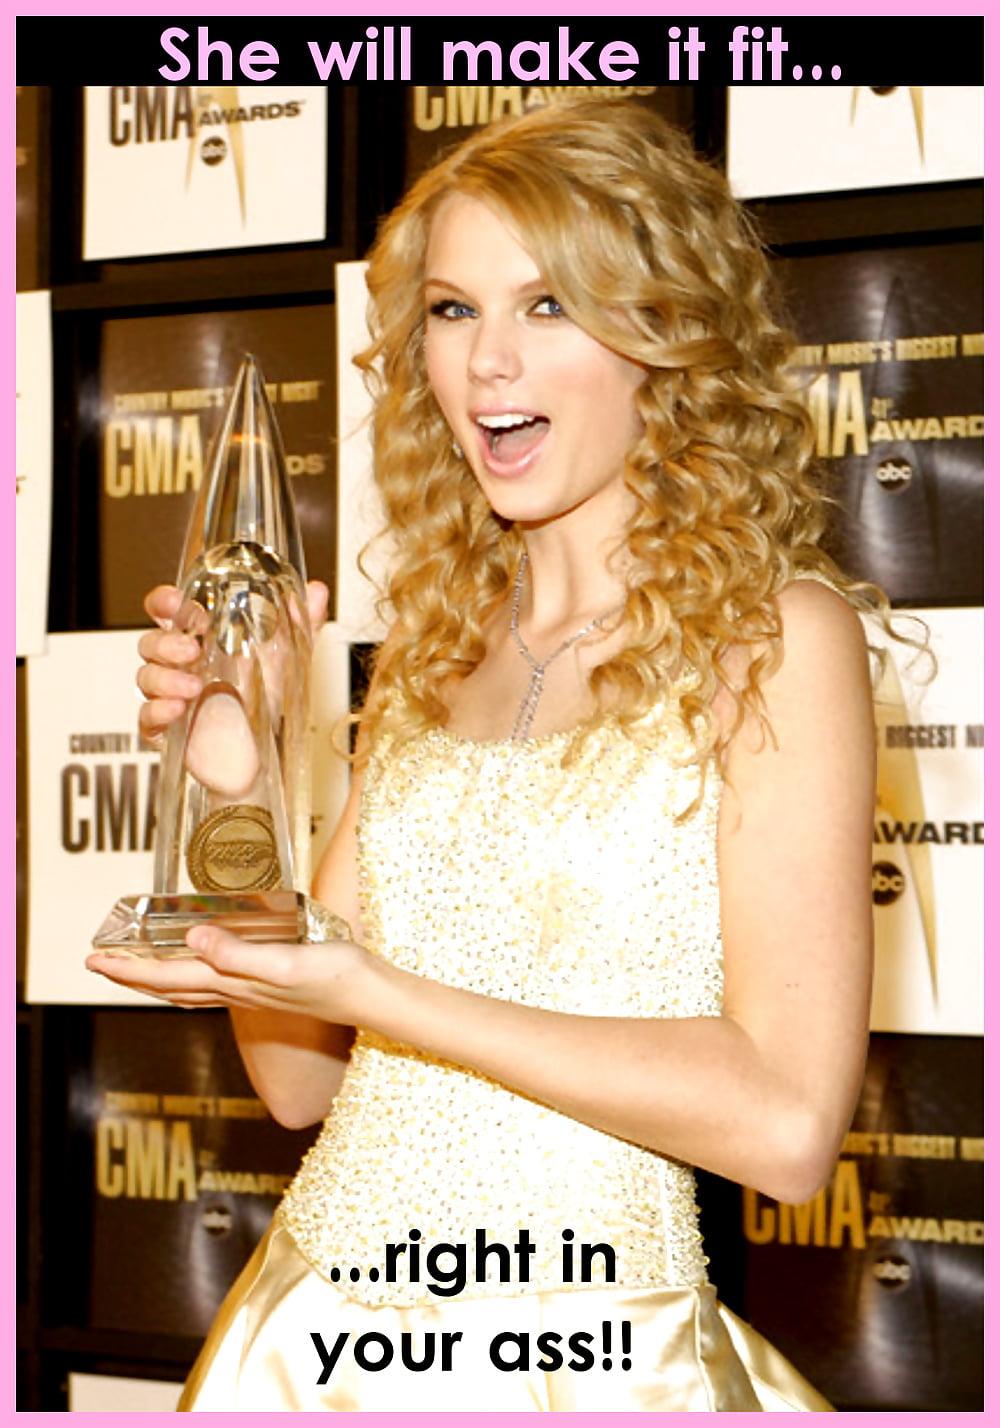 Taylor Swift Captions - 119 Pics | xHamster